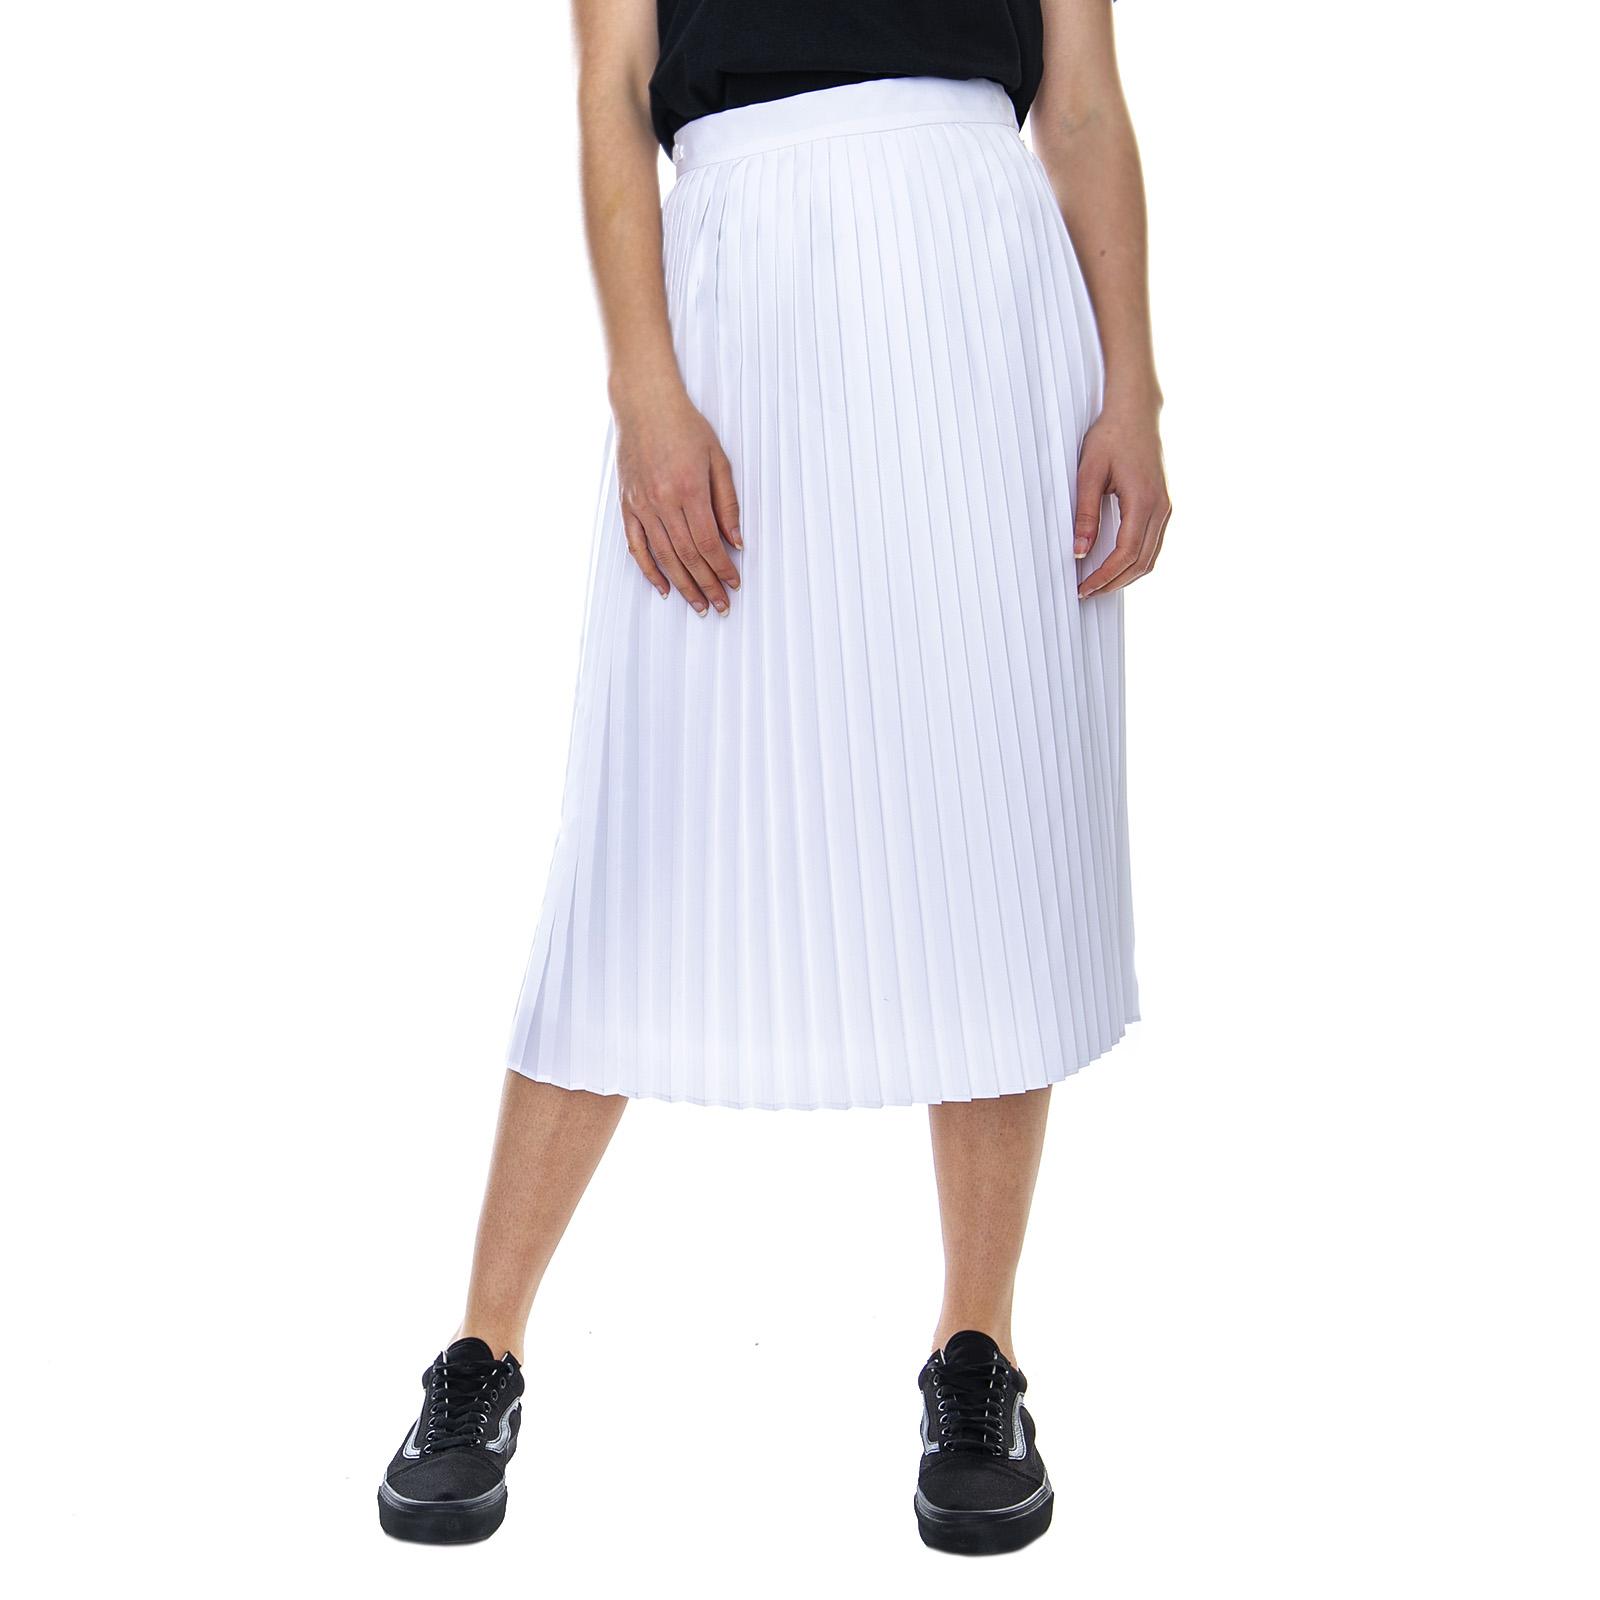 23707a5f374509 Plissé Skirt Weiß - Gonna Bianco - Lacoste ncfpvt4827-neue Kleidung ...